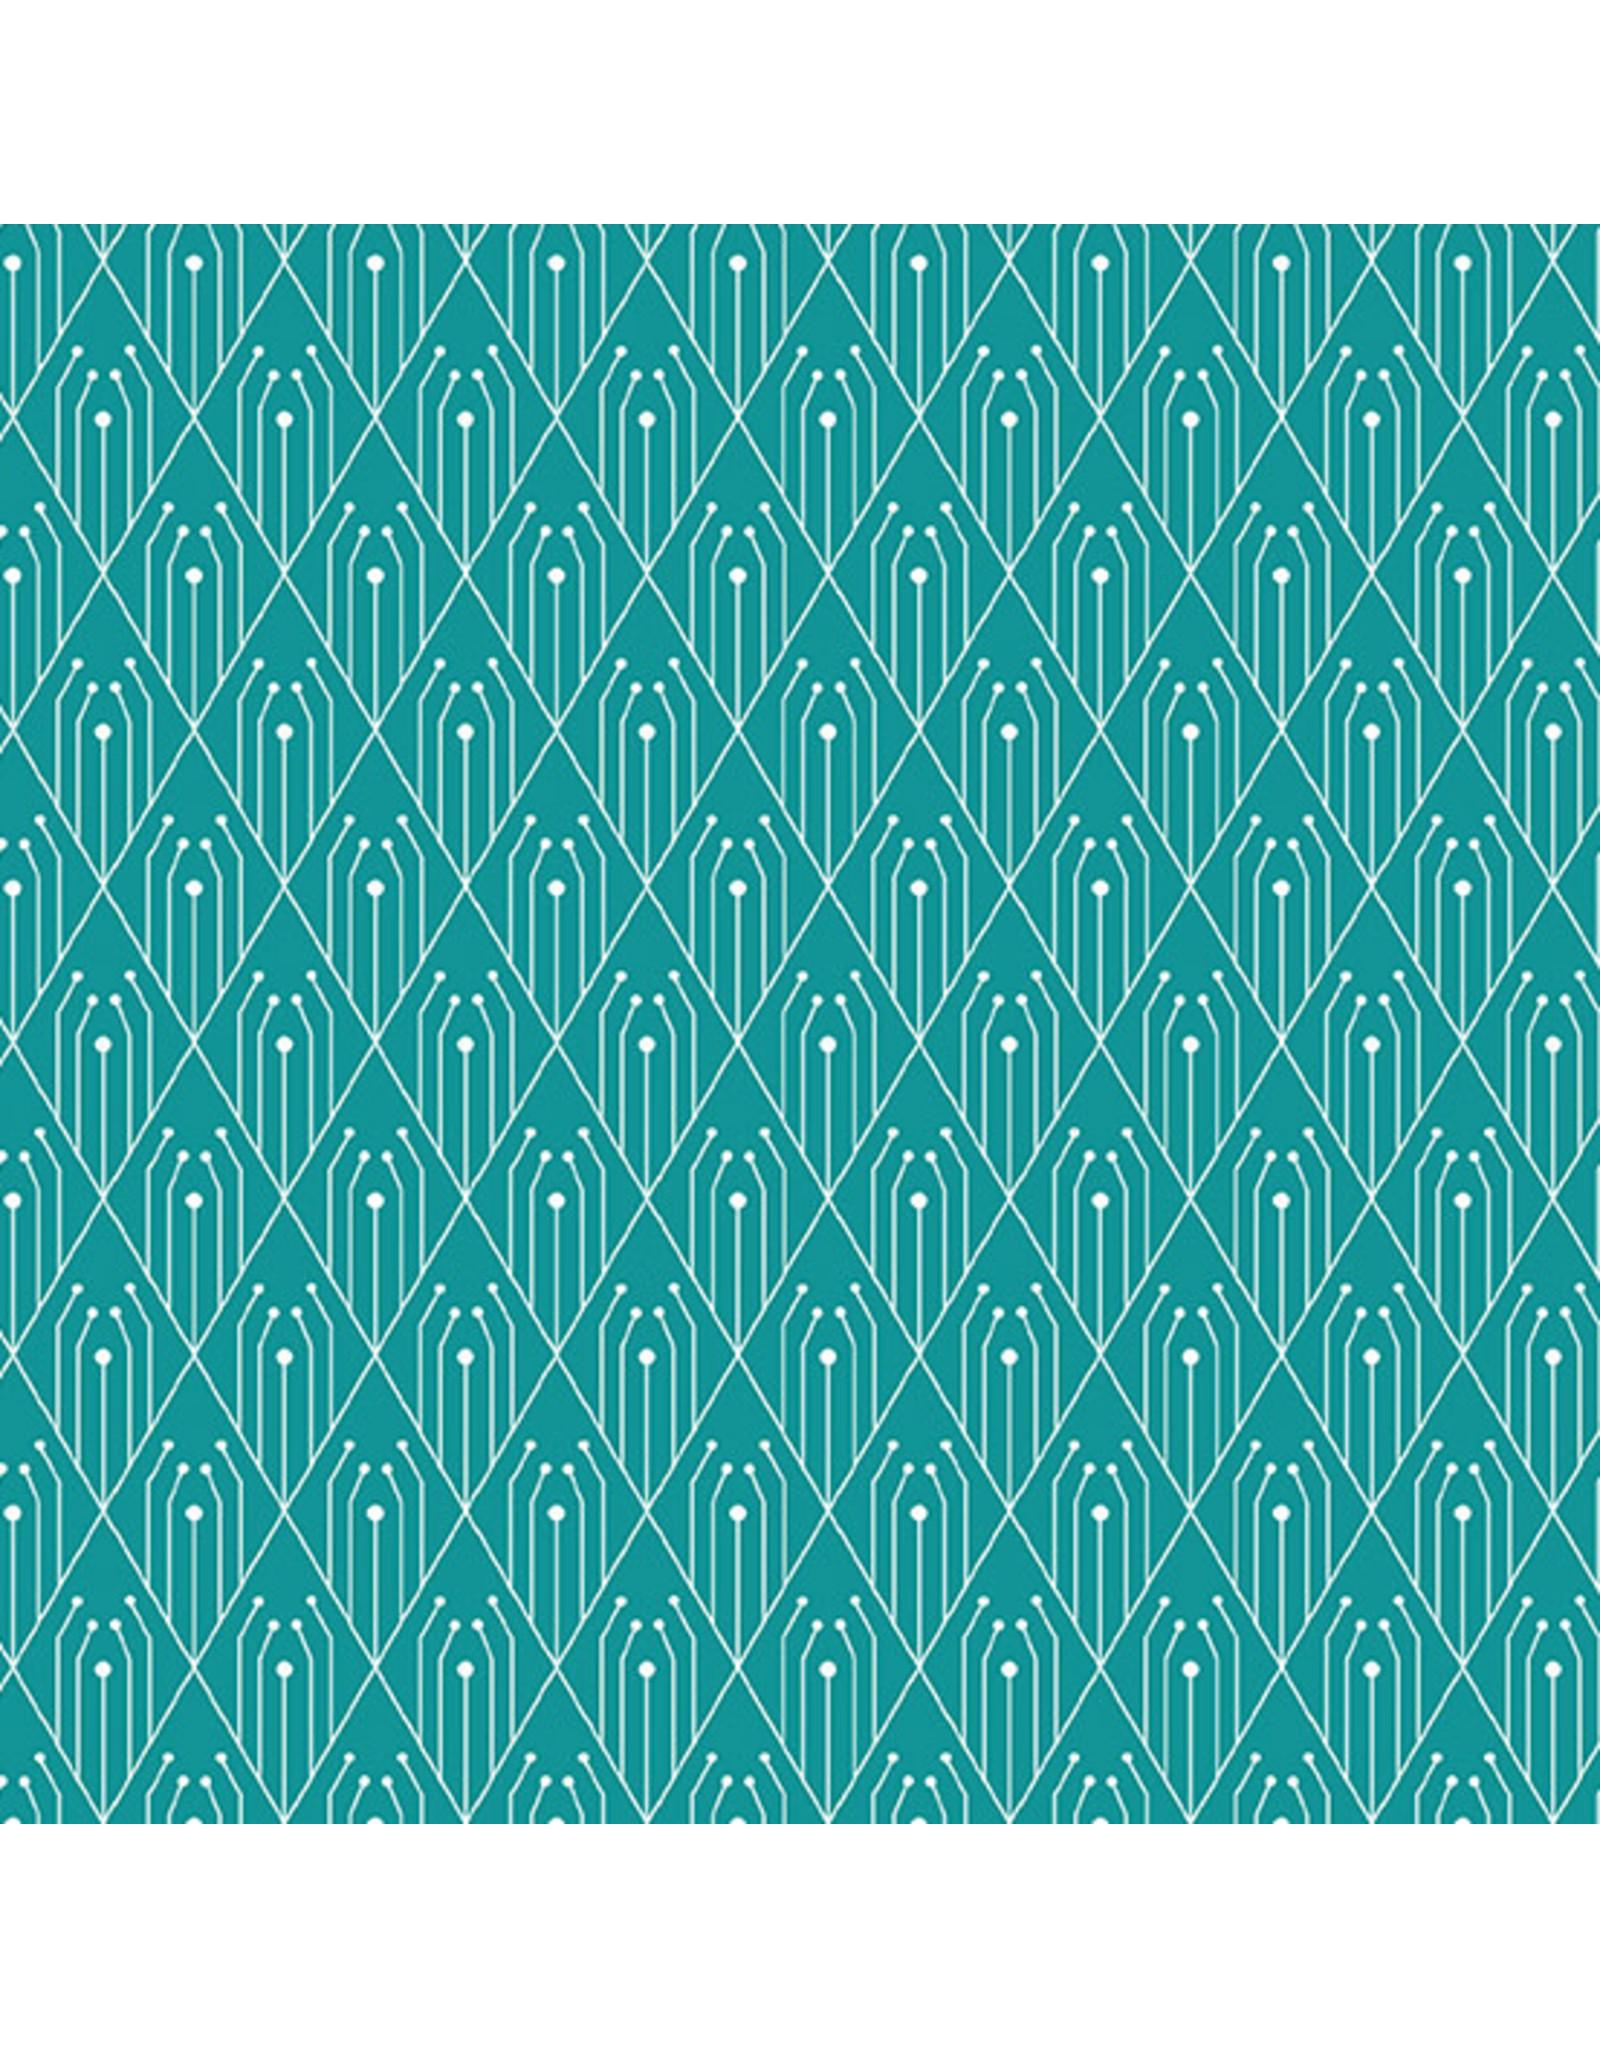 Giucy Giuce Century Prints, Deco Diamonds in Teal, Fabric Half-Yards